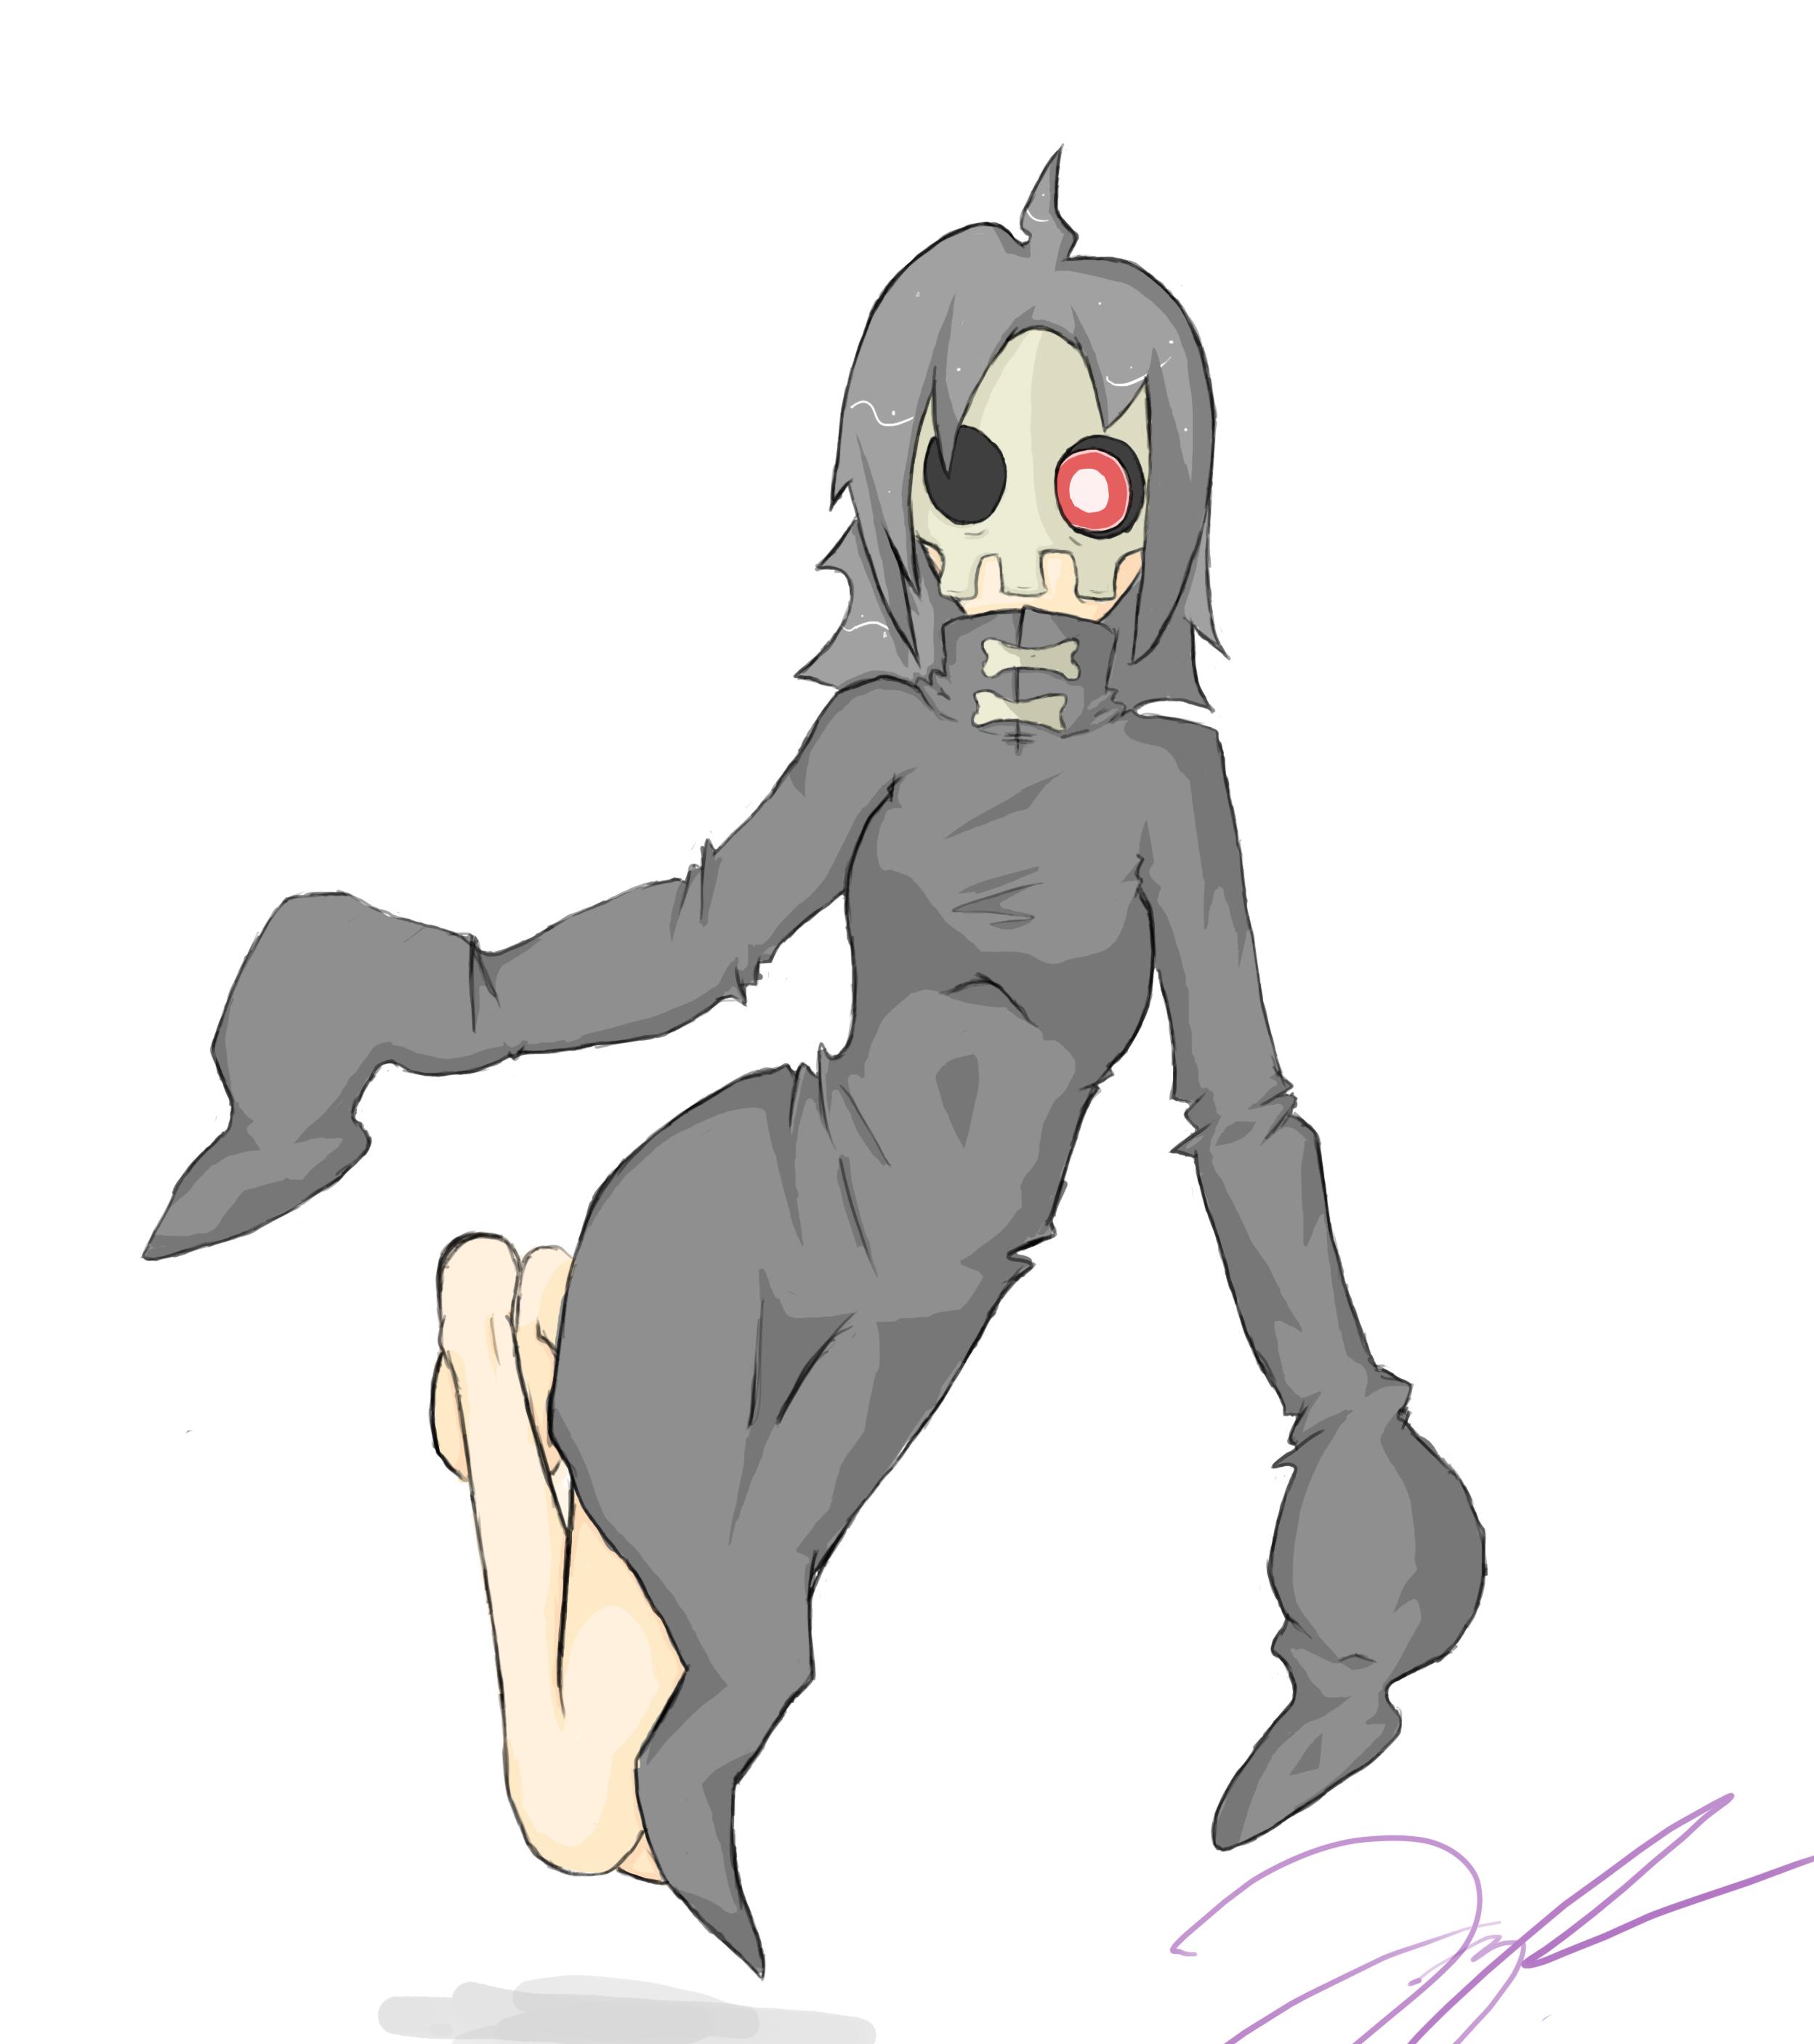 Image 465126 Gijinka Moe Anthropomorphism Know Your Meme